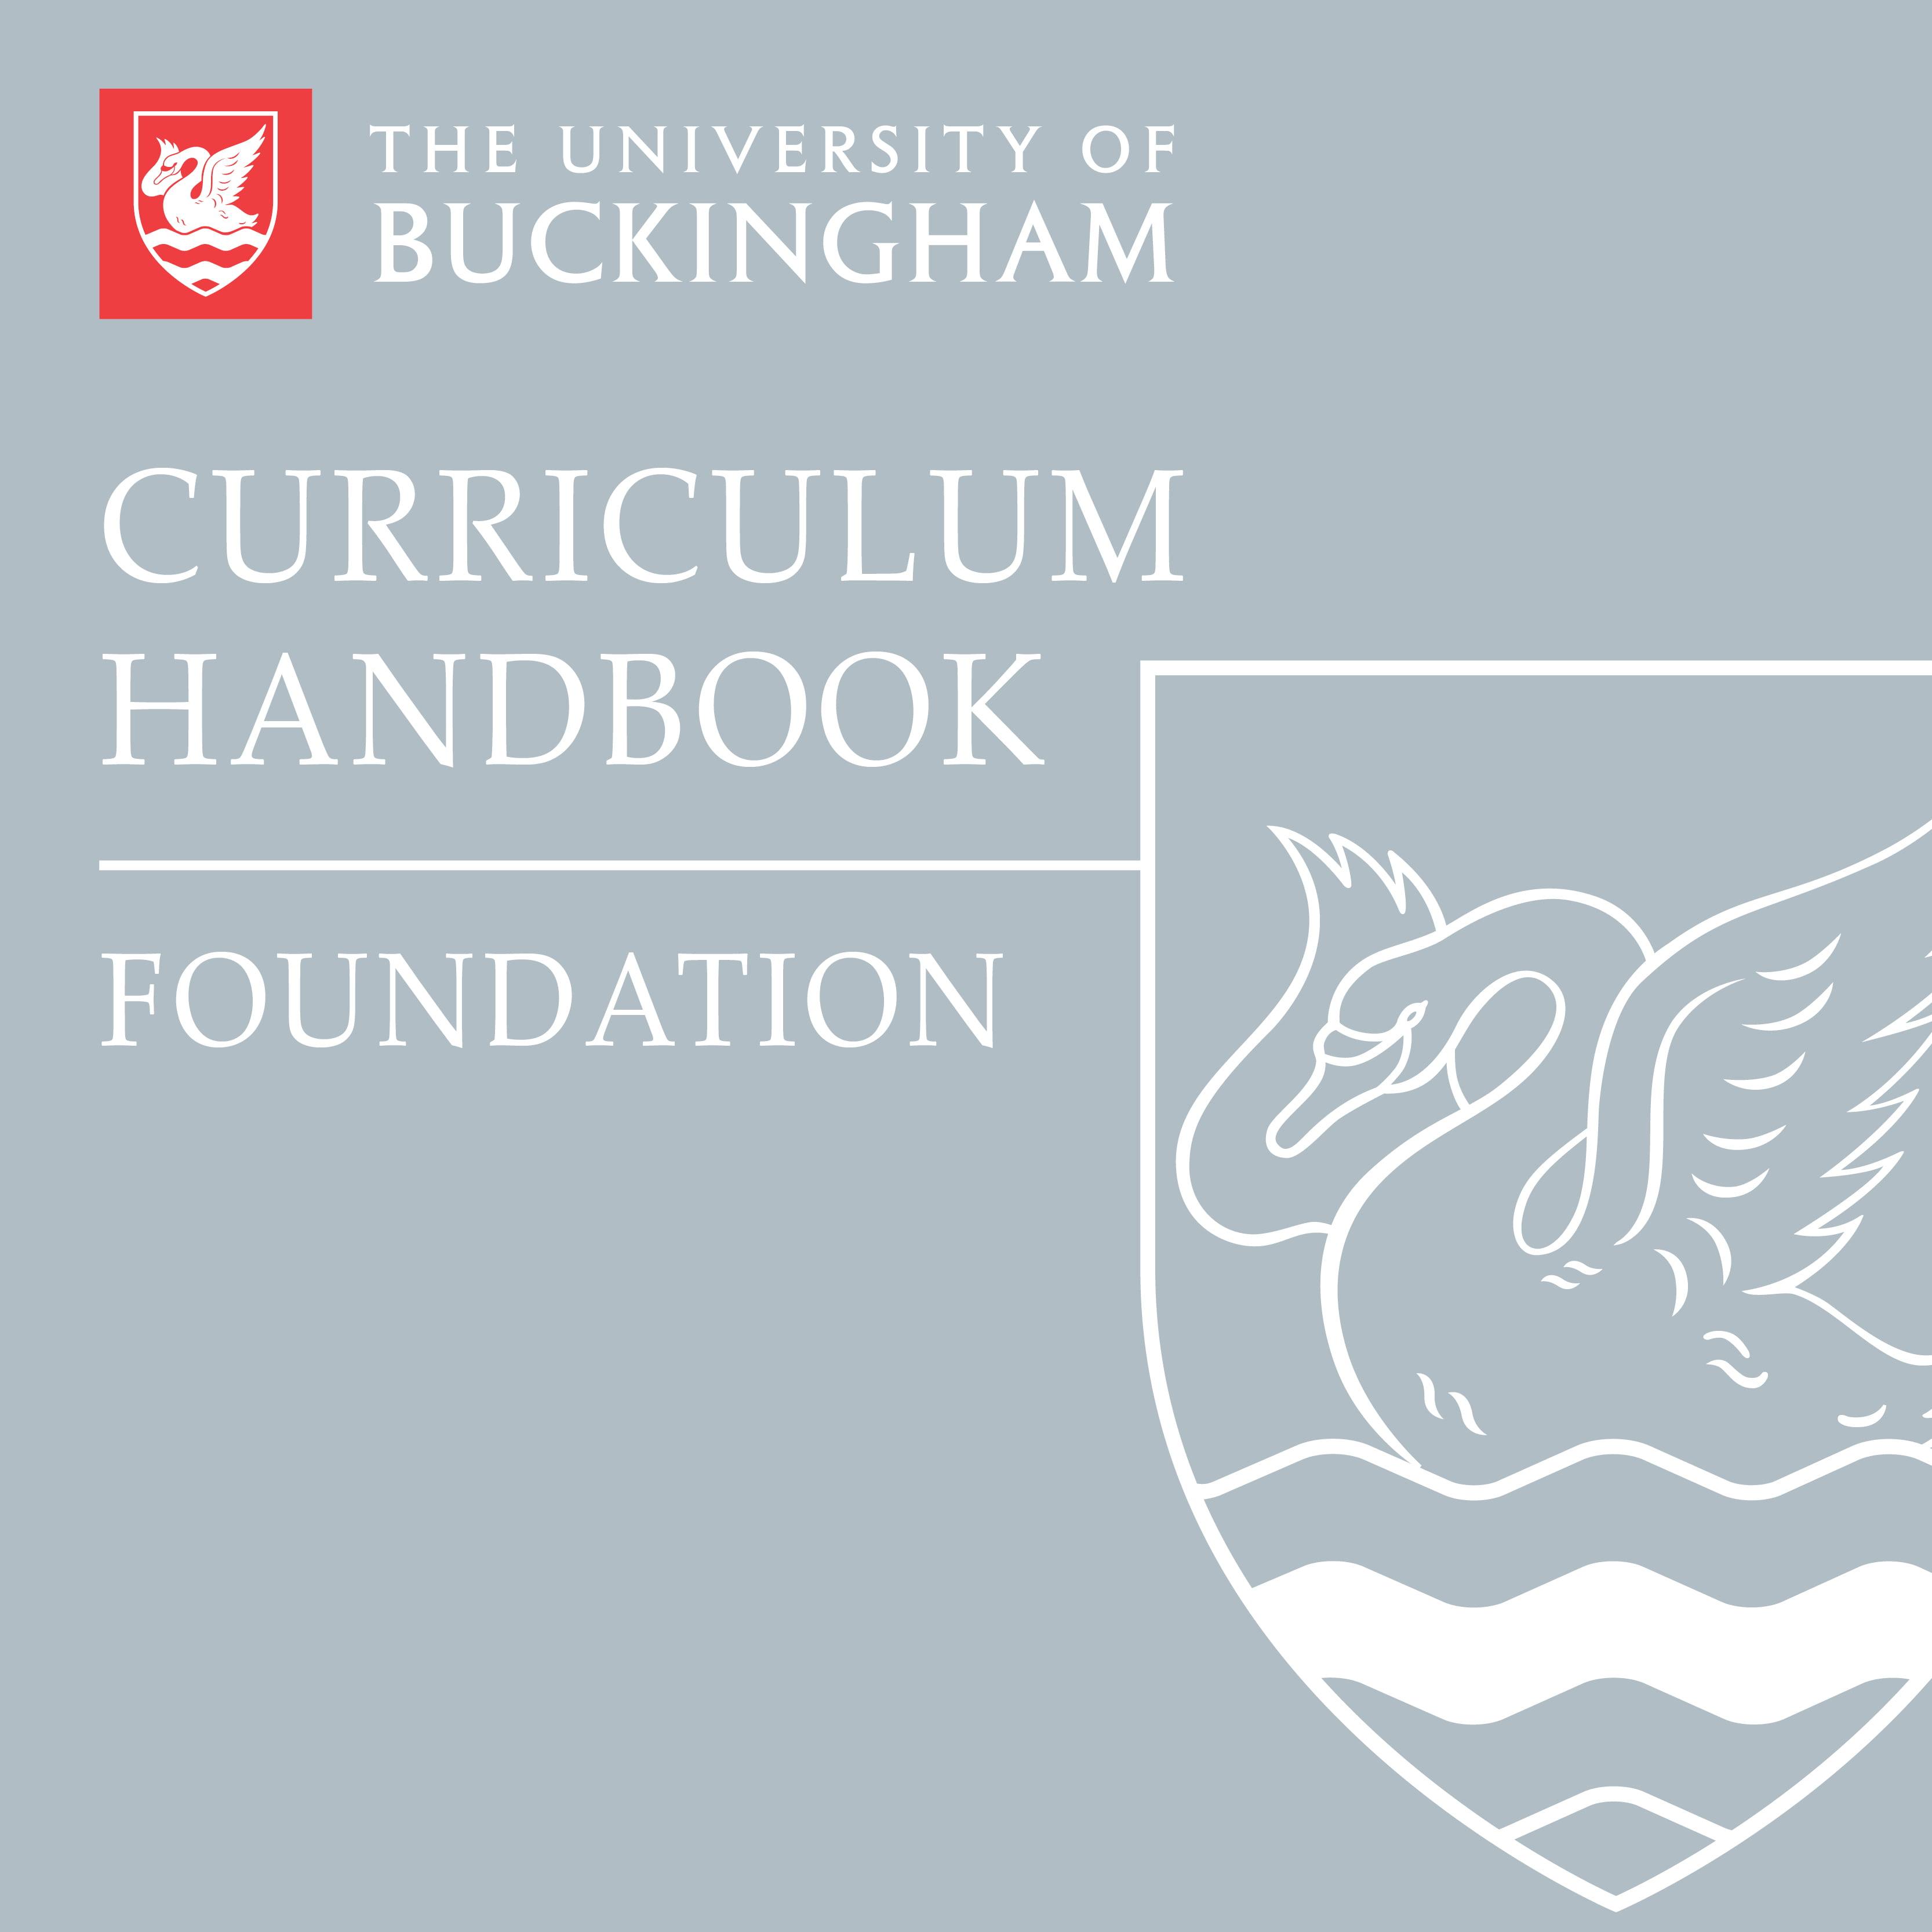 Curriculum Handbook - Foundation - front cover - online